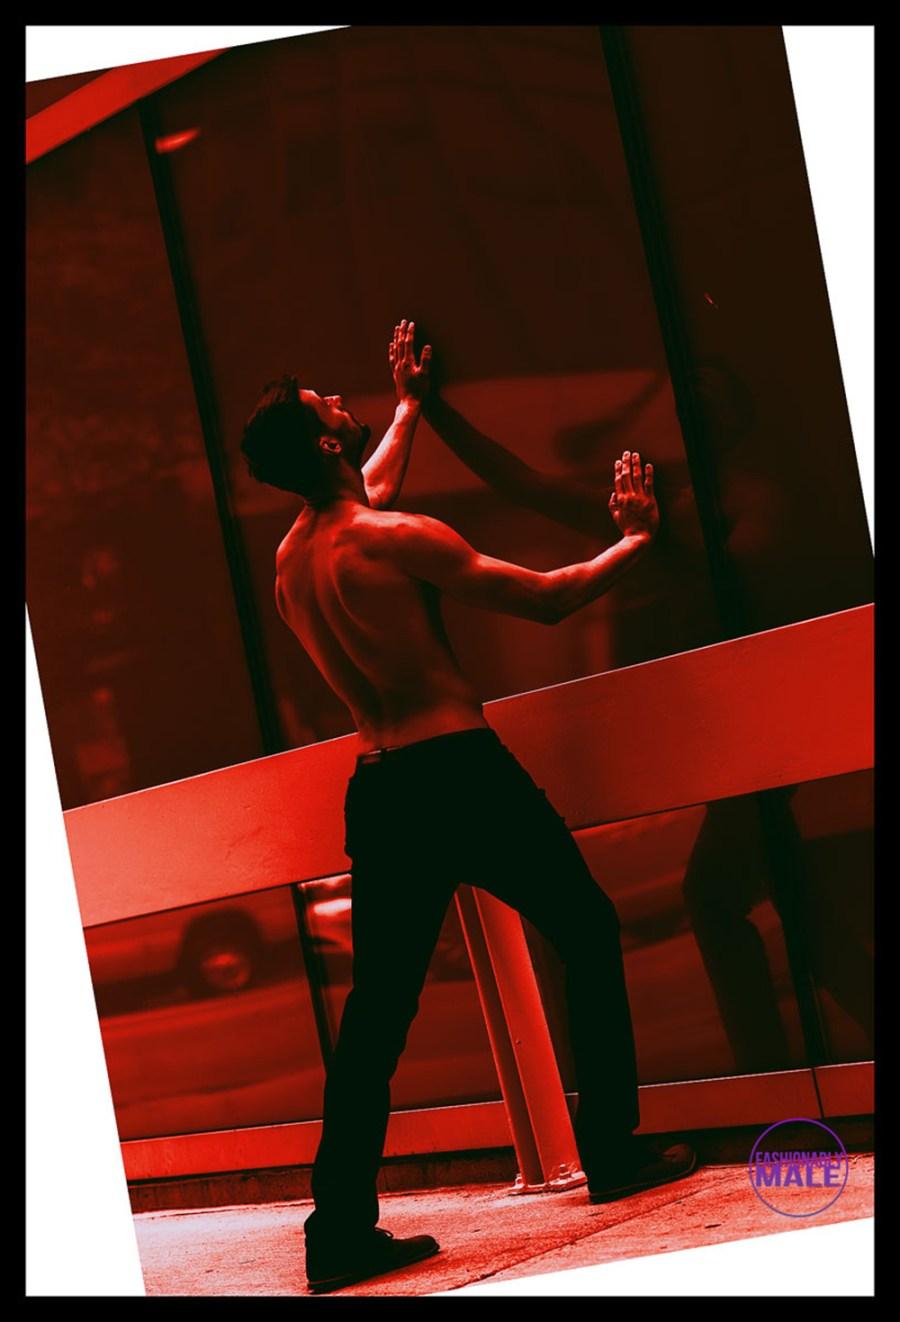 Armando Adajar presents: 'Trapped' featuring Marty Riva